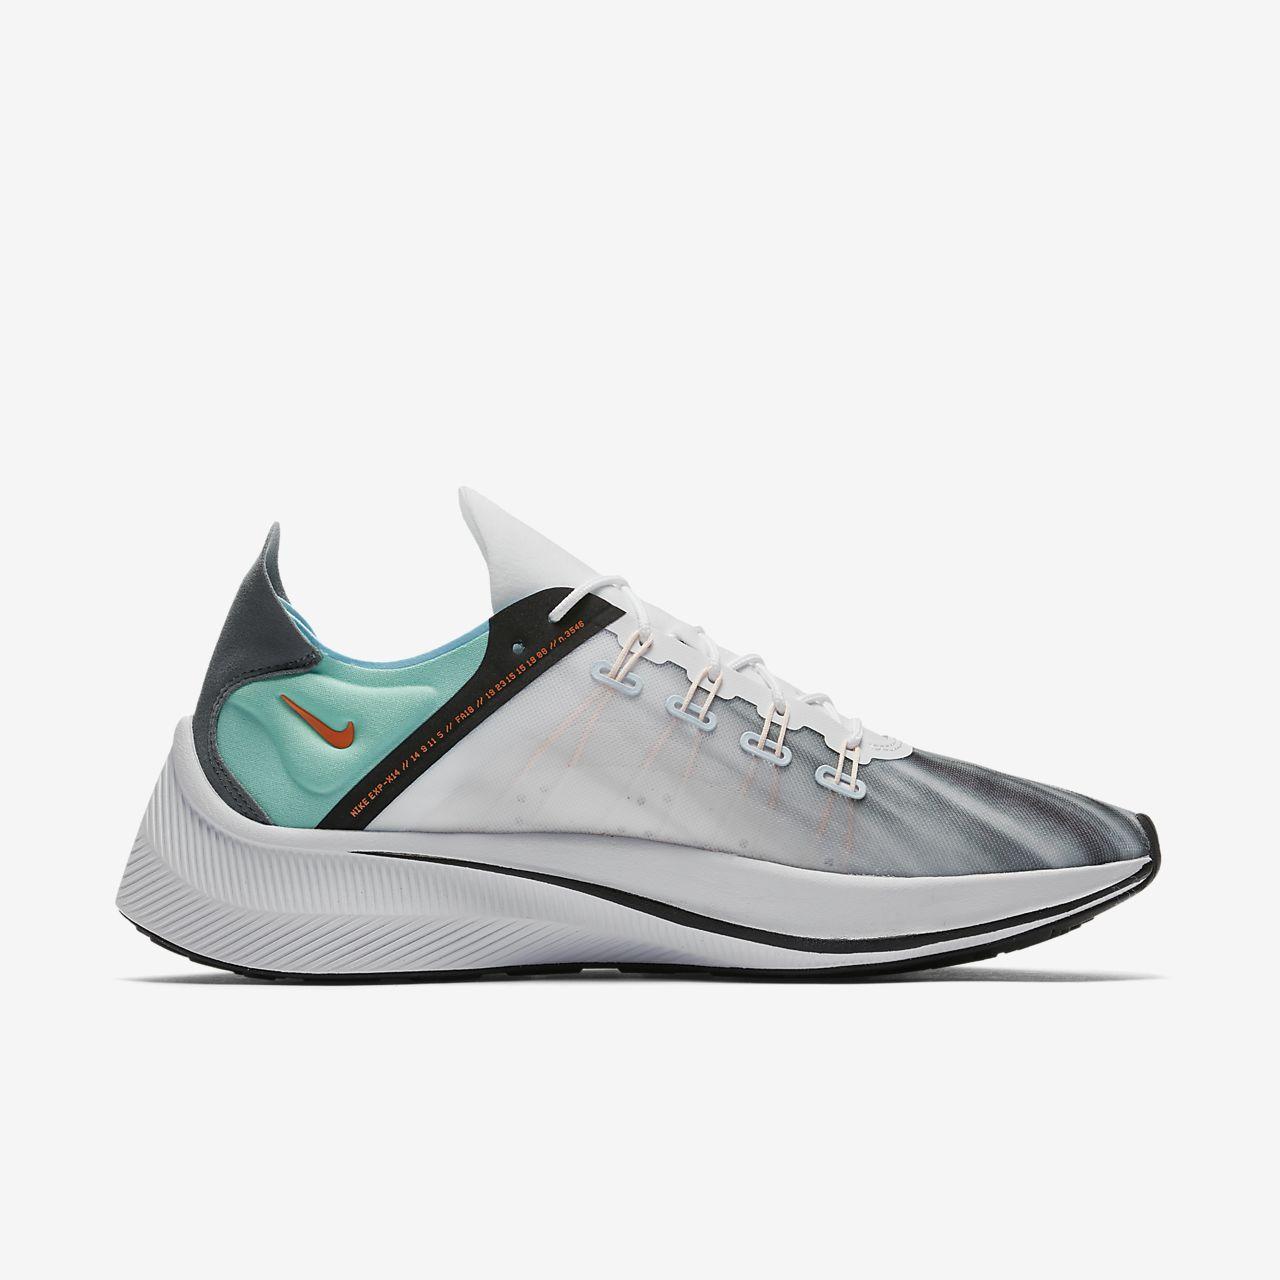 Scarpe Running Uomo Nike Exp x14 Scarpe da corsa su strada